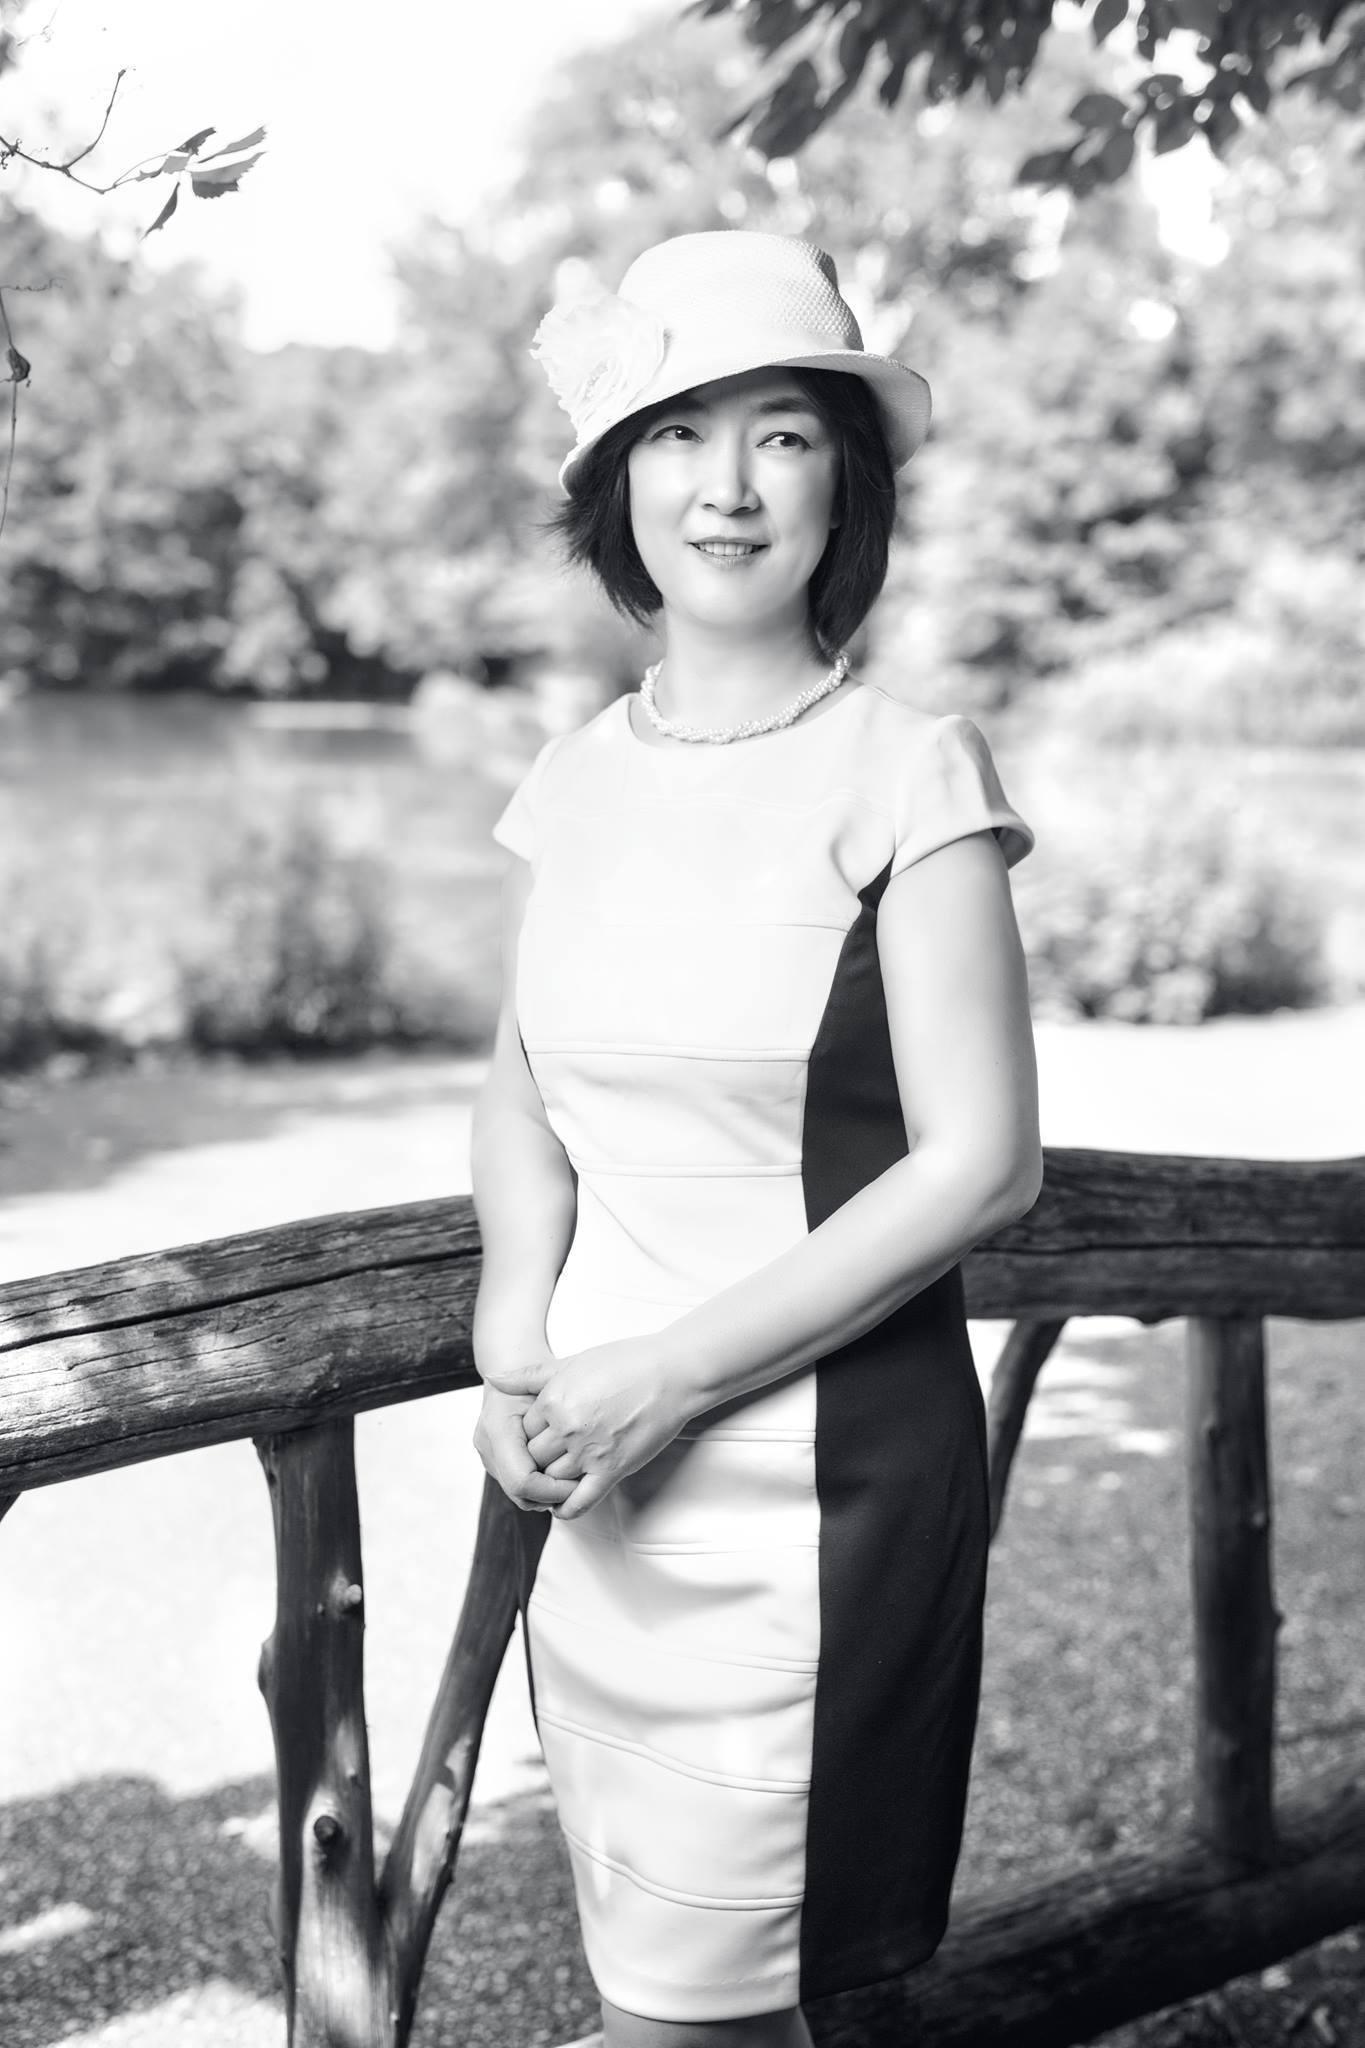 Jennifer at Prospect Park, on June 29, 2017 曾錚2017年6月29日攝於紐約展望公園(Prospect Park)  Photo credit: Benny Zhang Studio  攝影: 張炳乾